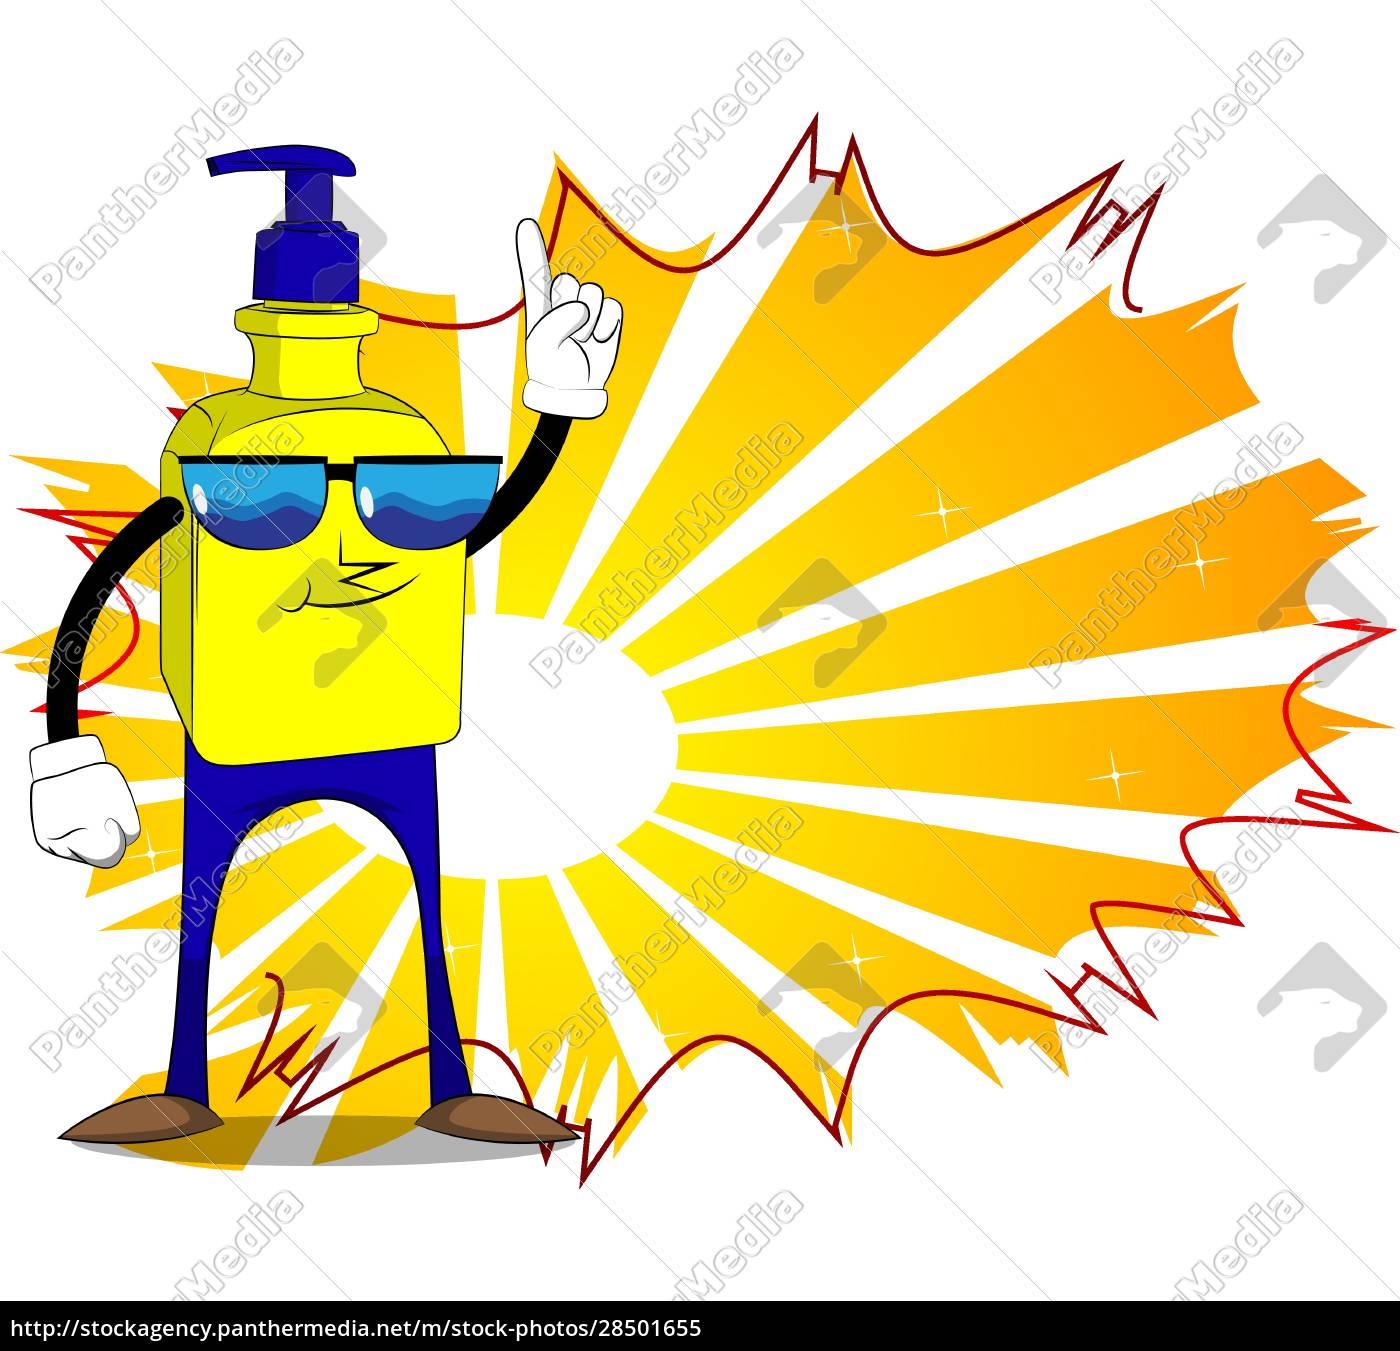 bottle, of, hand, sanitizer, gel, with - 28501655